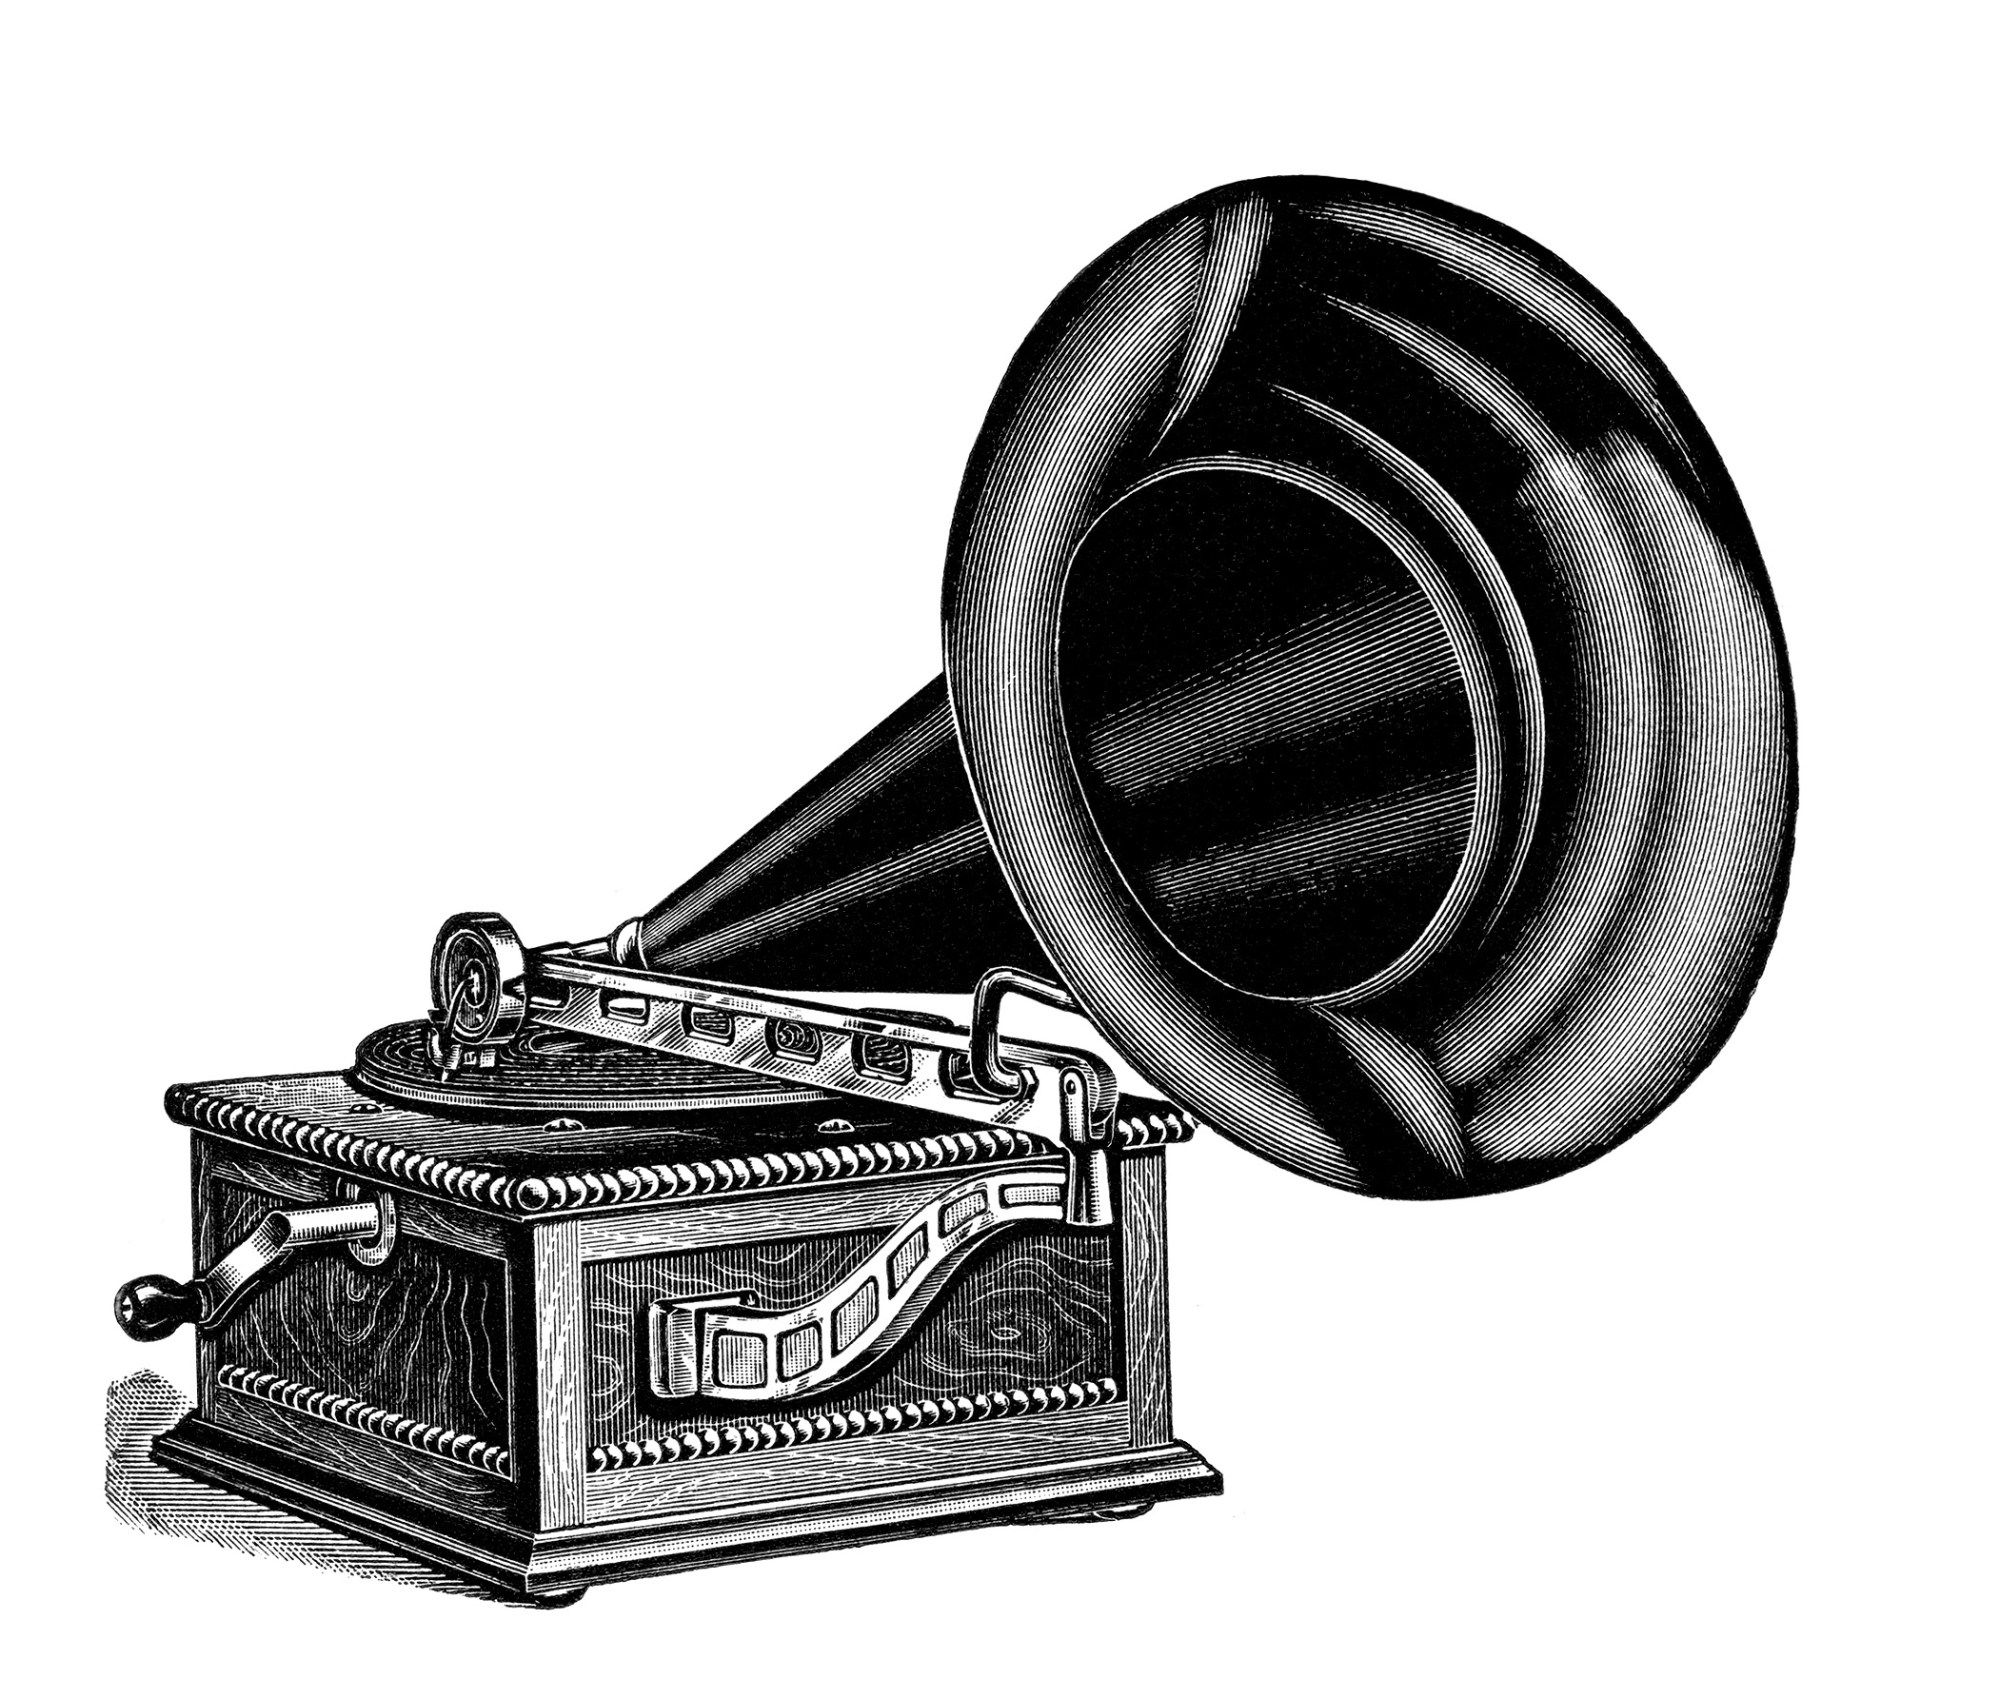 Old phonograph clipart jpg free download talking machine clip art, vintage gramophone image, black ... jpg free download